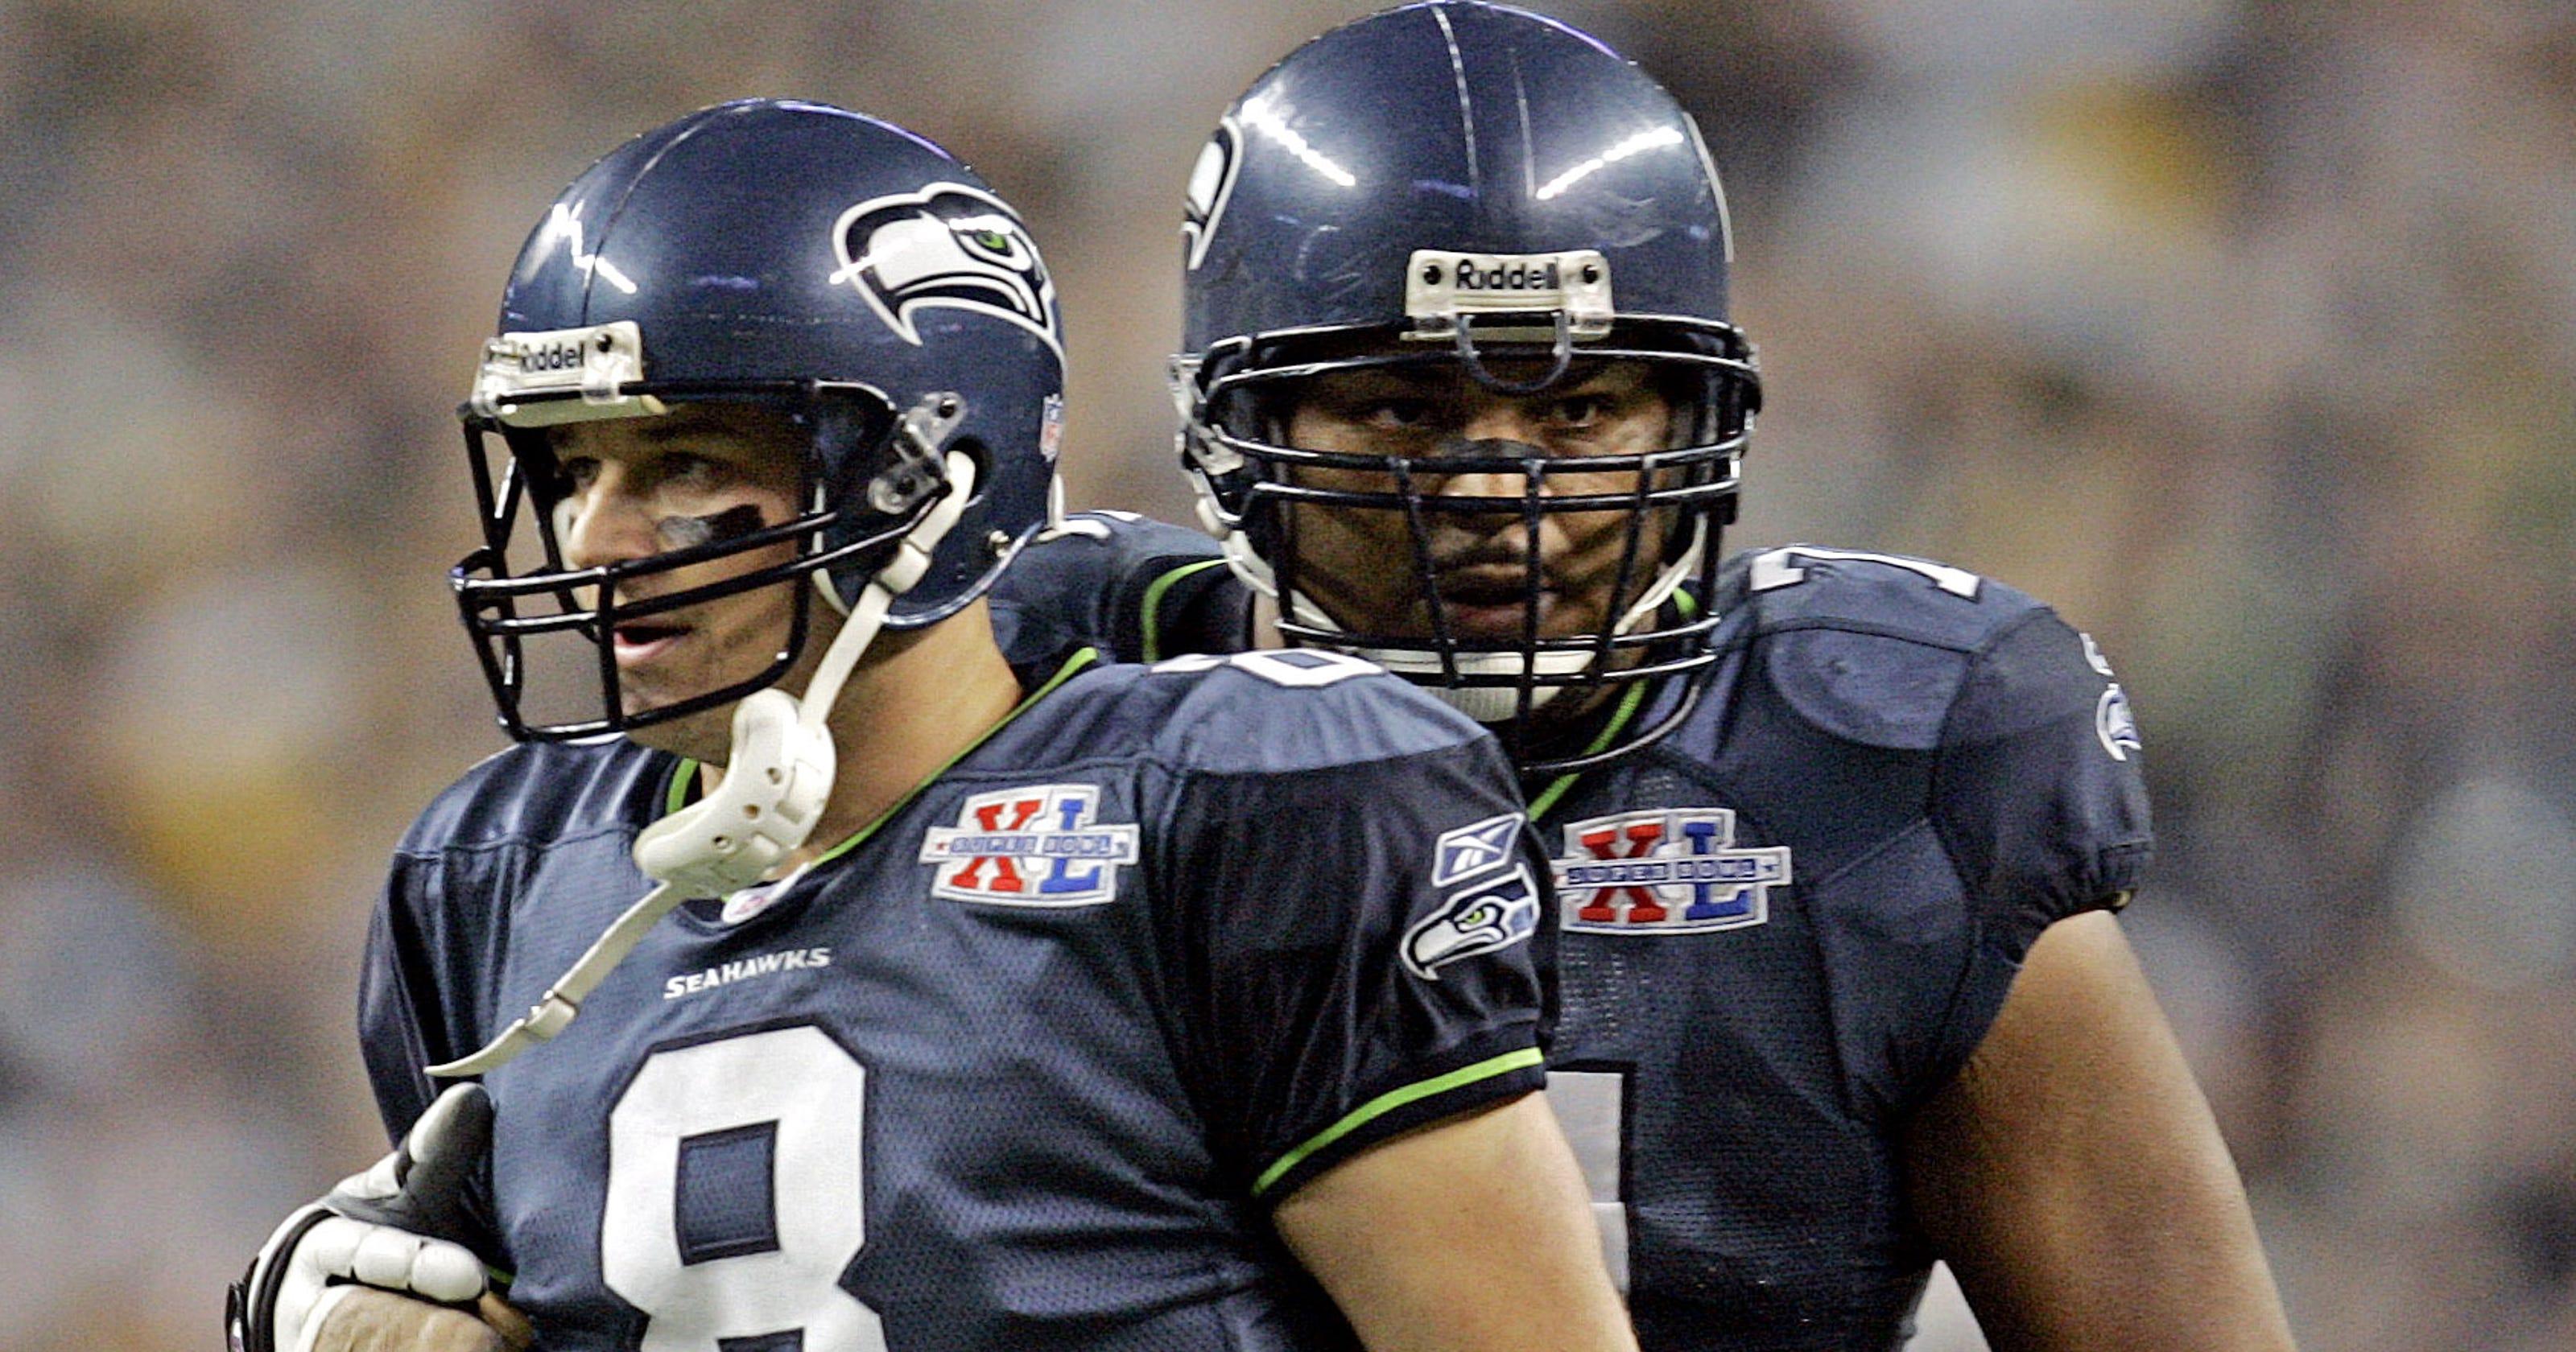 Seahawks  all-time Super Bowl team includes 2005 stars 9f93ada3f